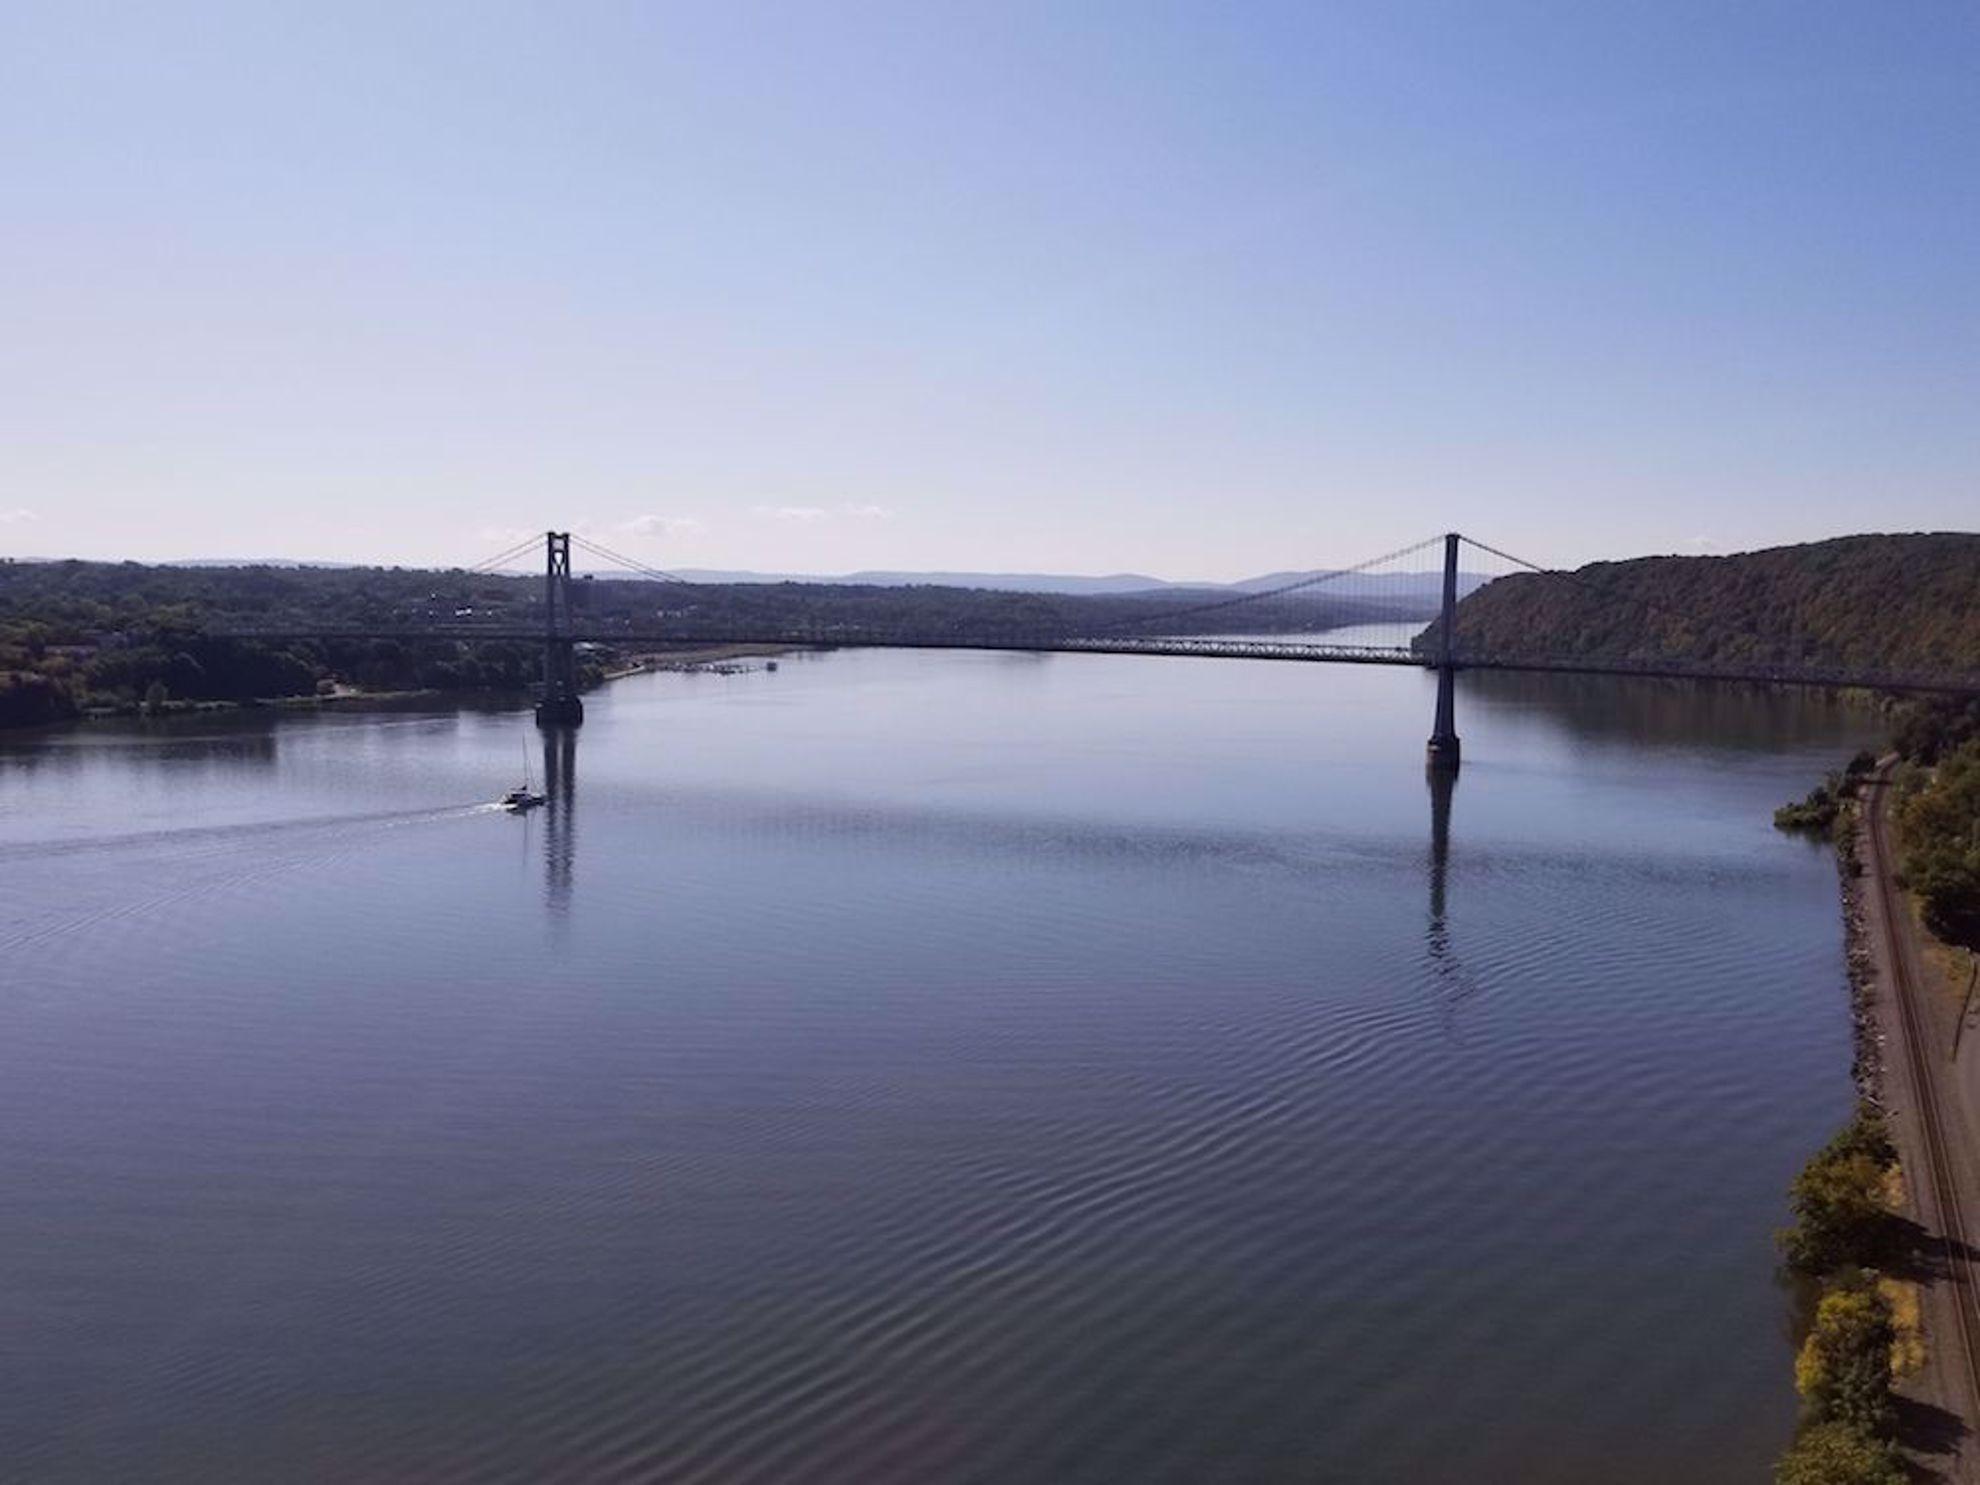 Hudson River from pedestrian and bike bridge